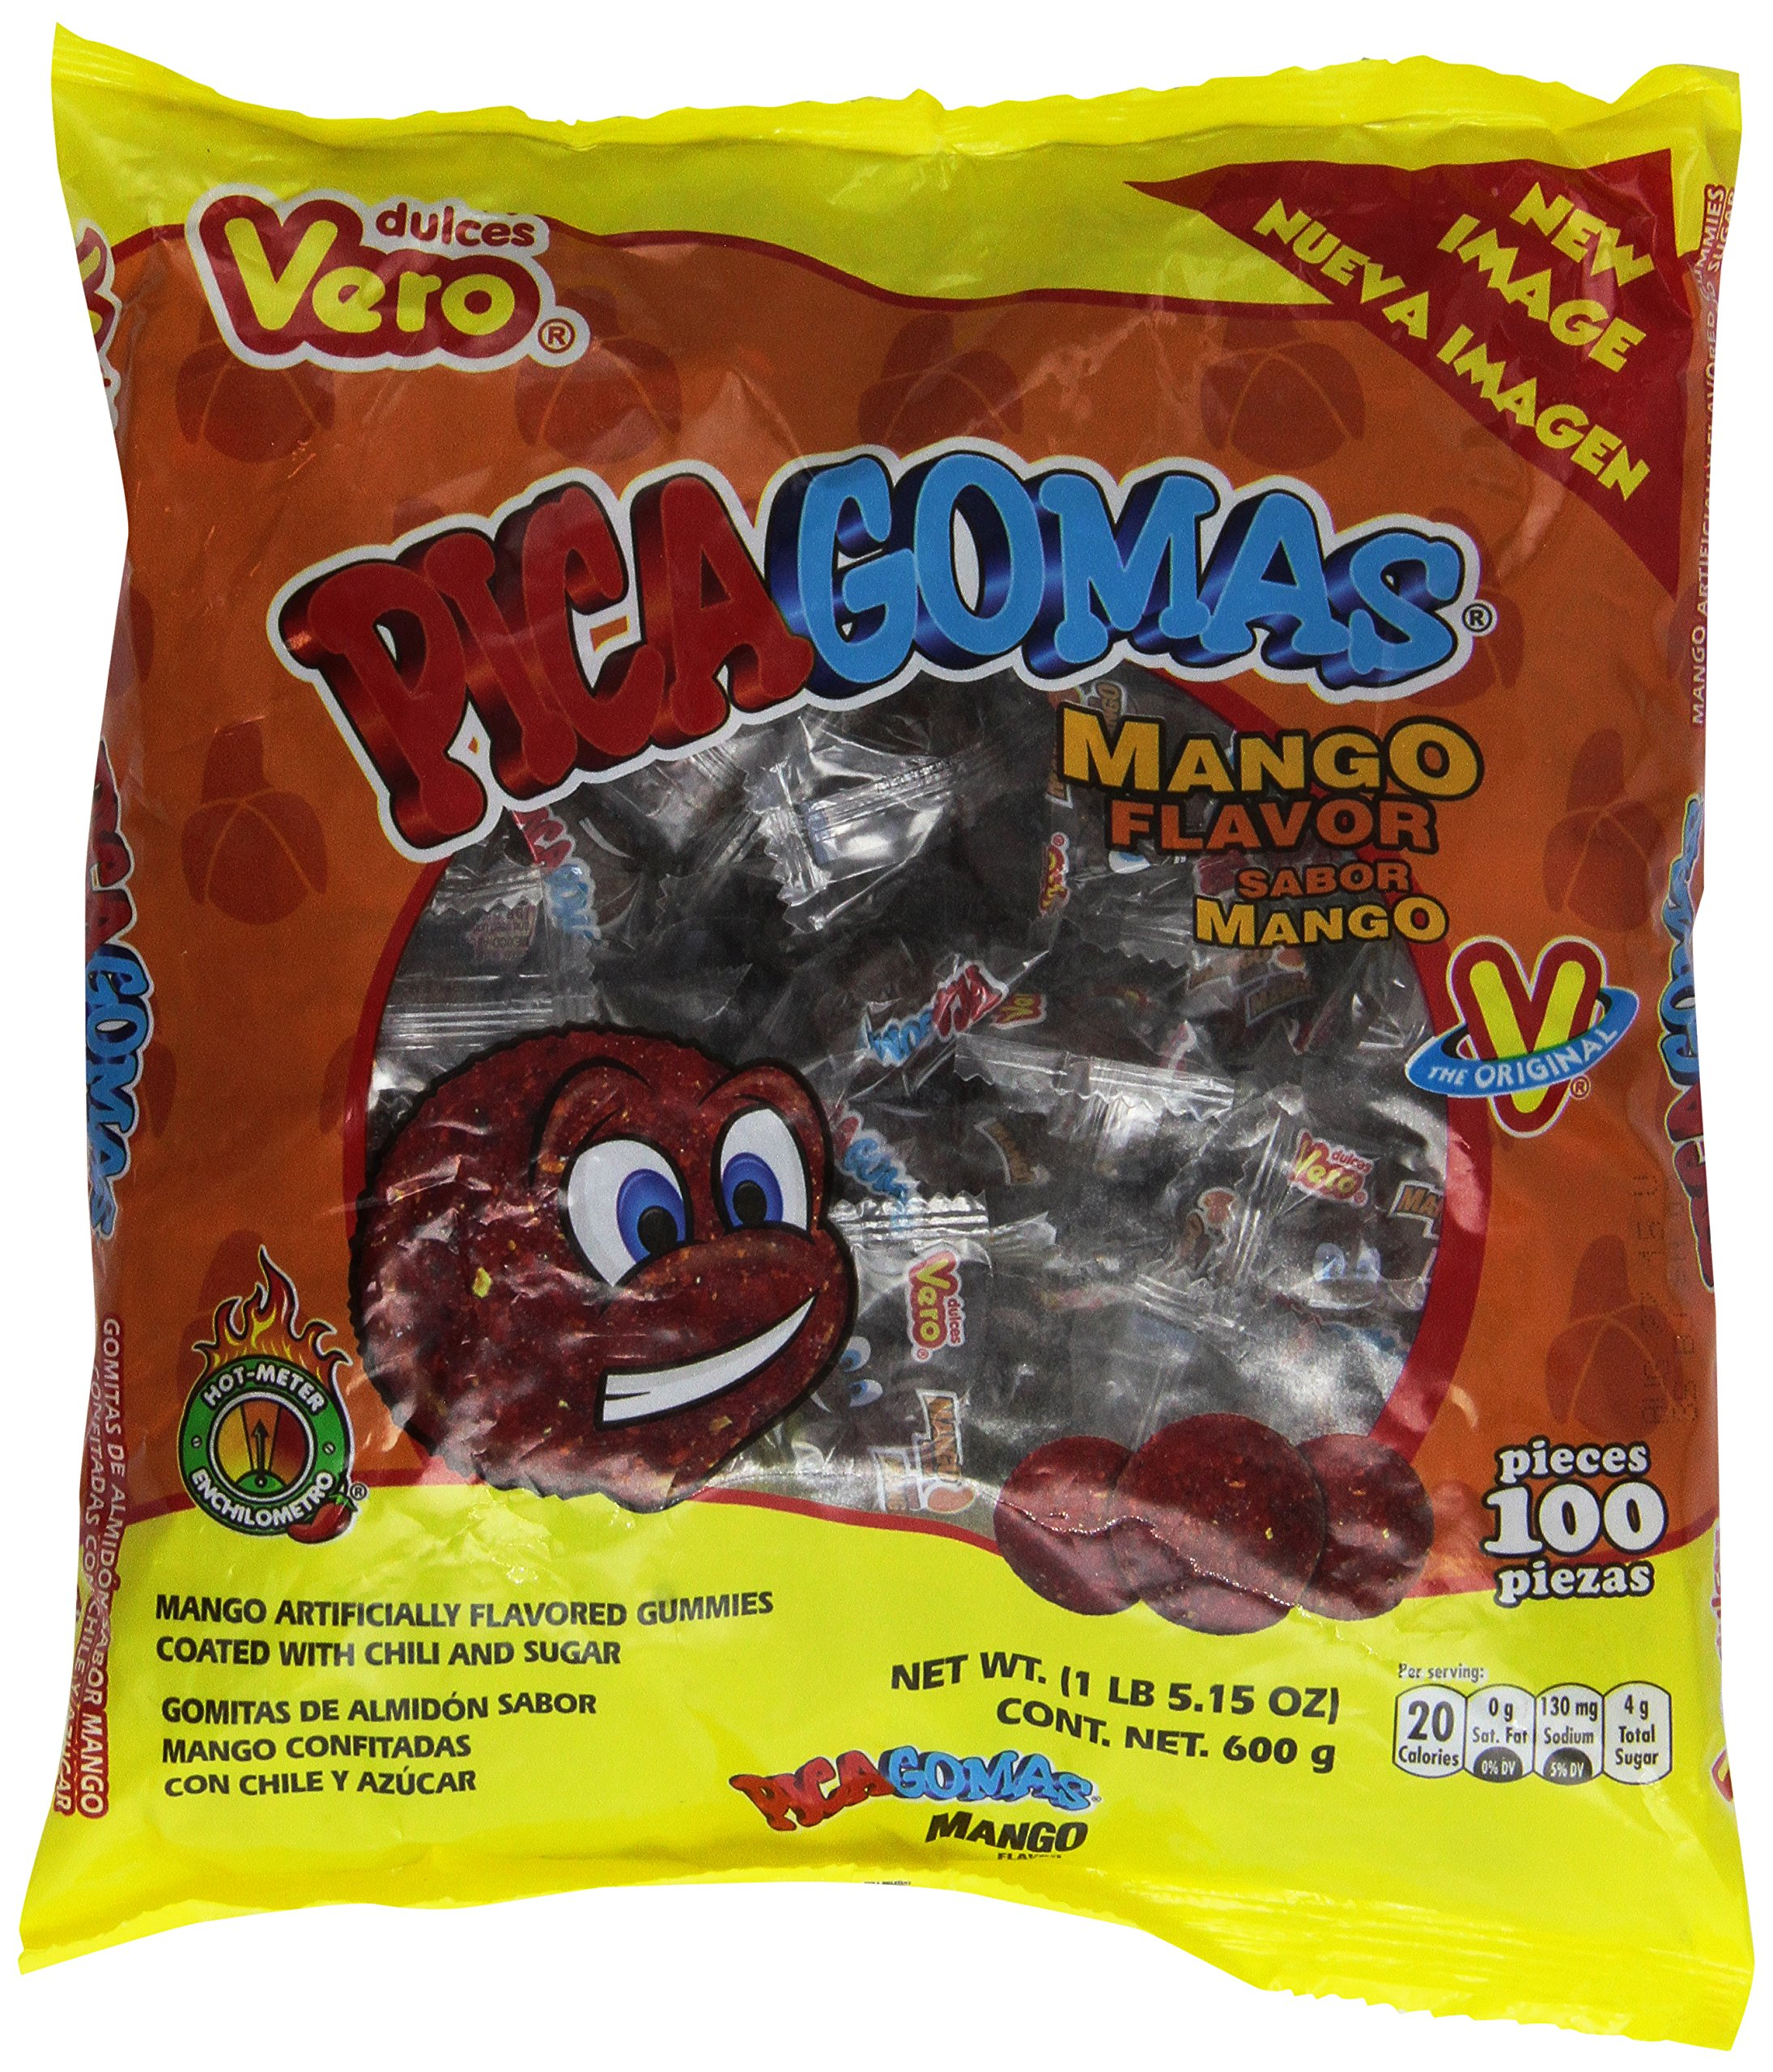 Pica Gomas Sabor Dulces Vero Chili Mango Flavor Mexican Candy